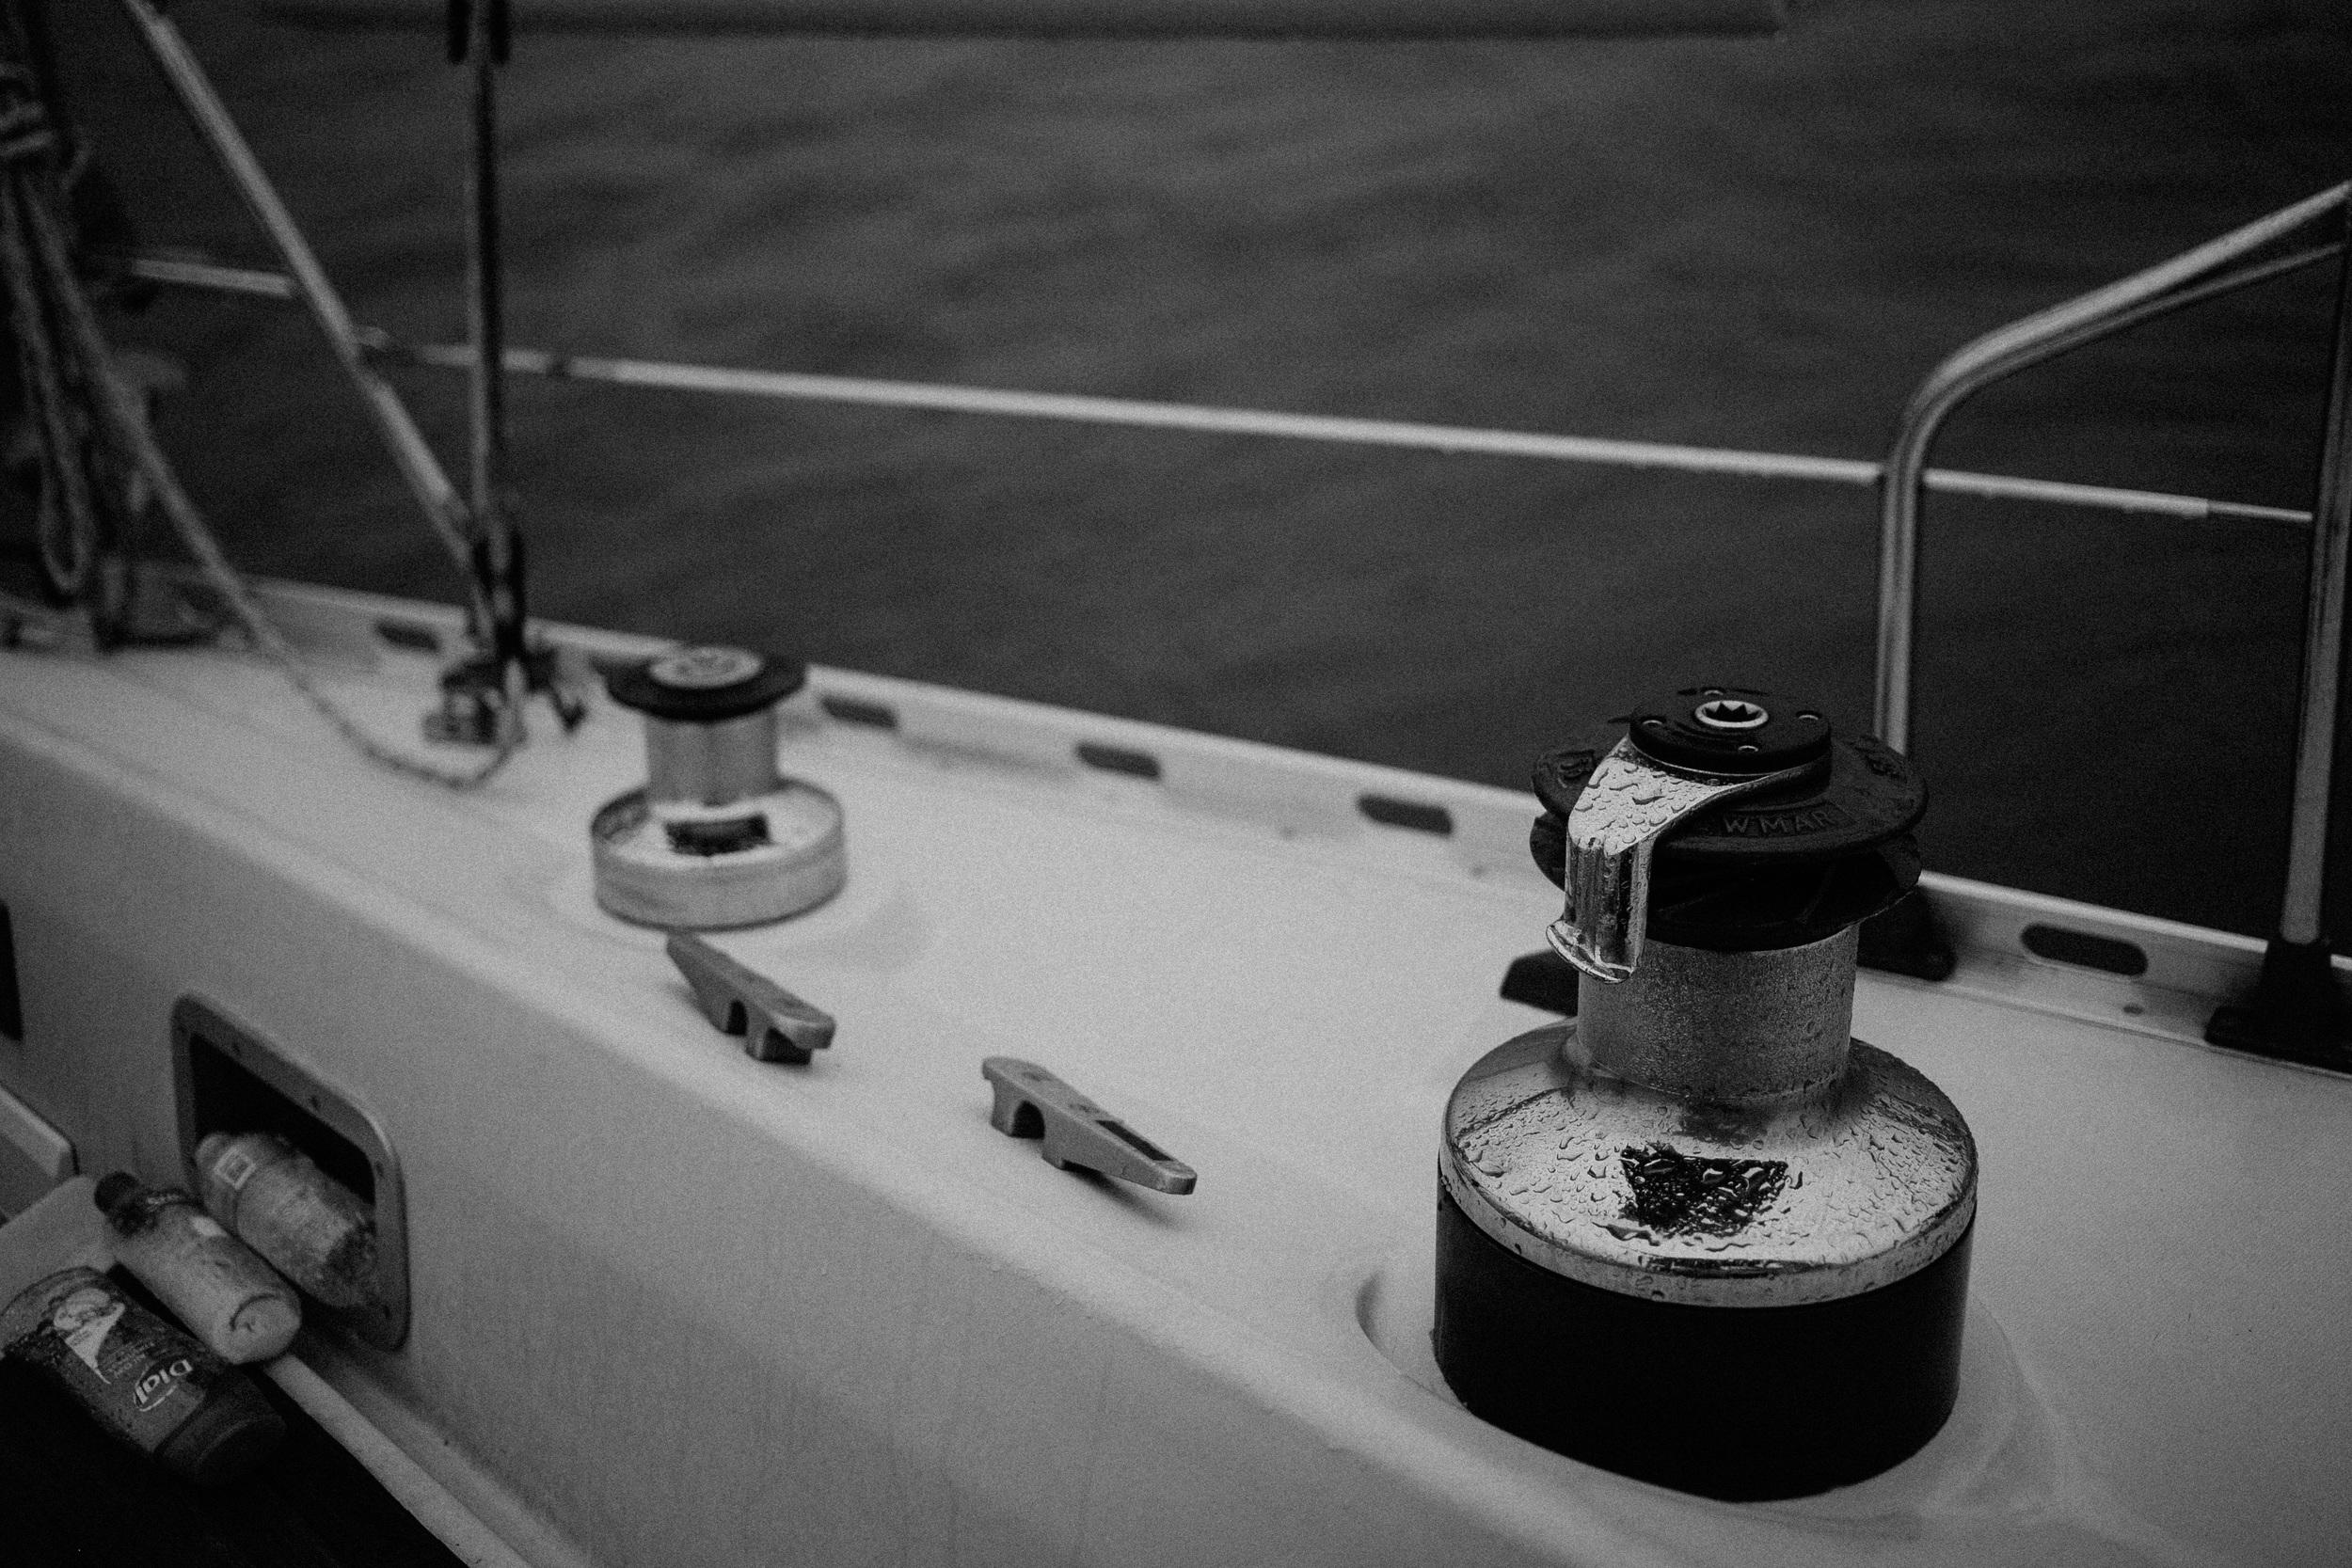 sailing-with-papa-5537.jpg